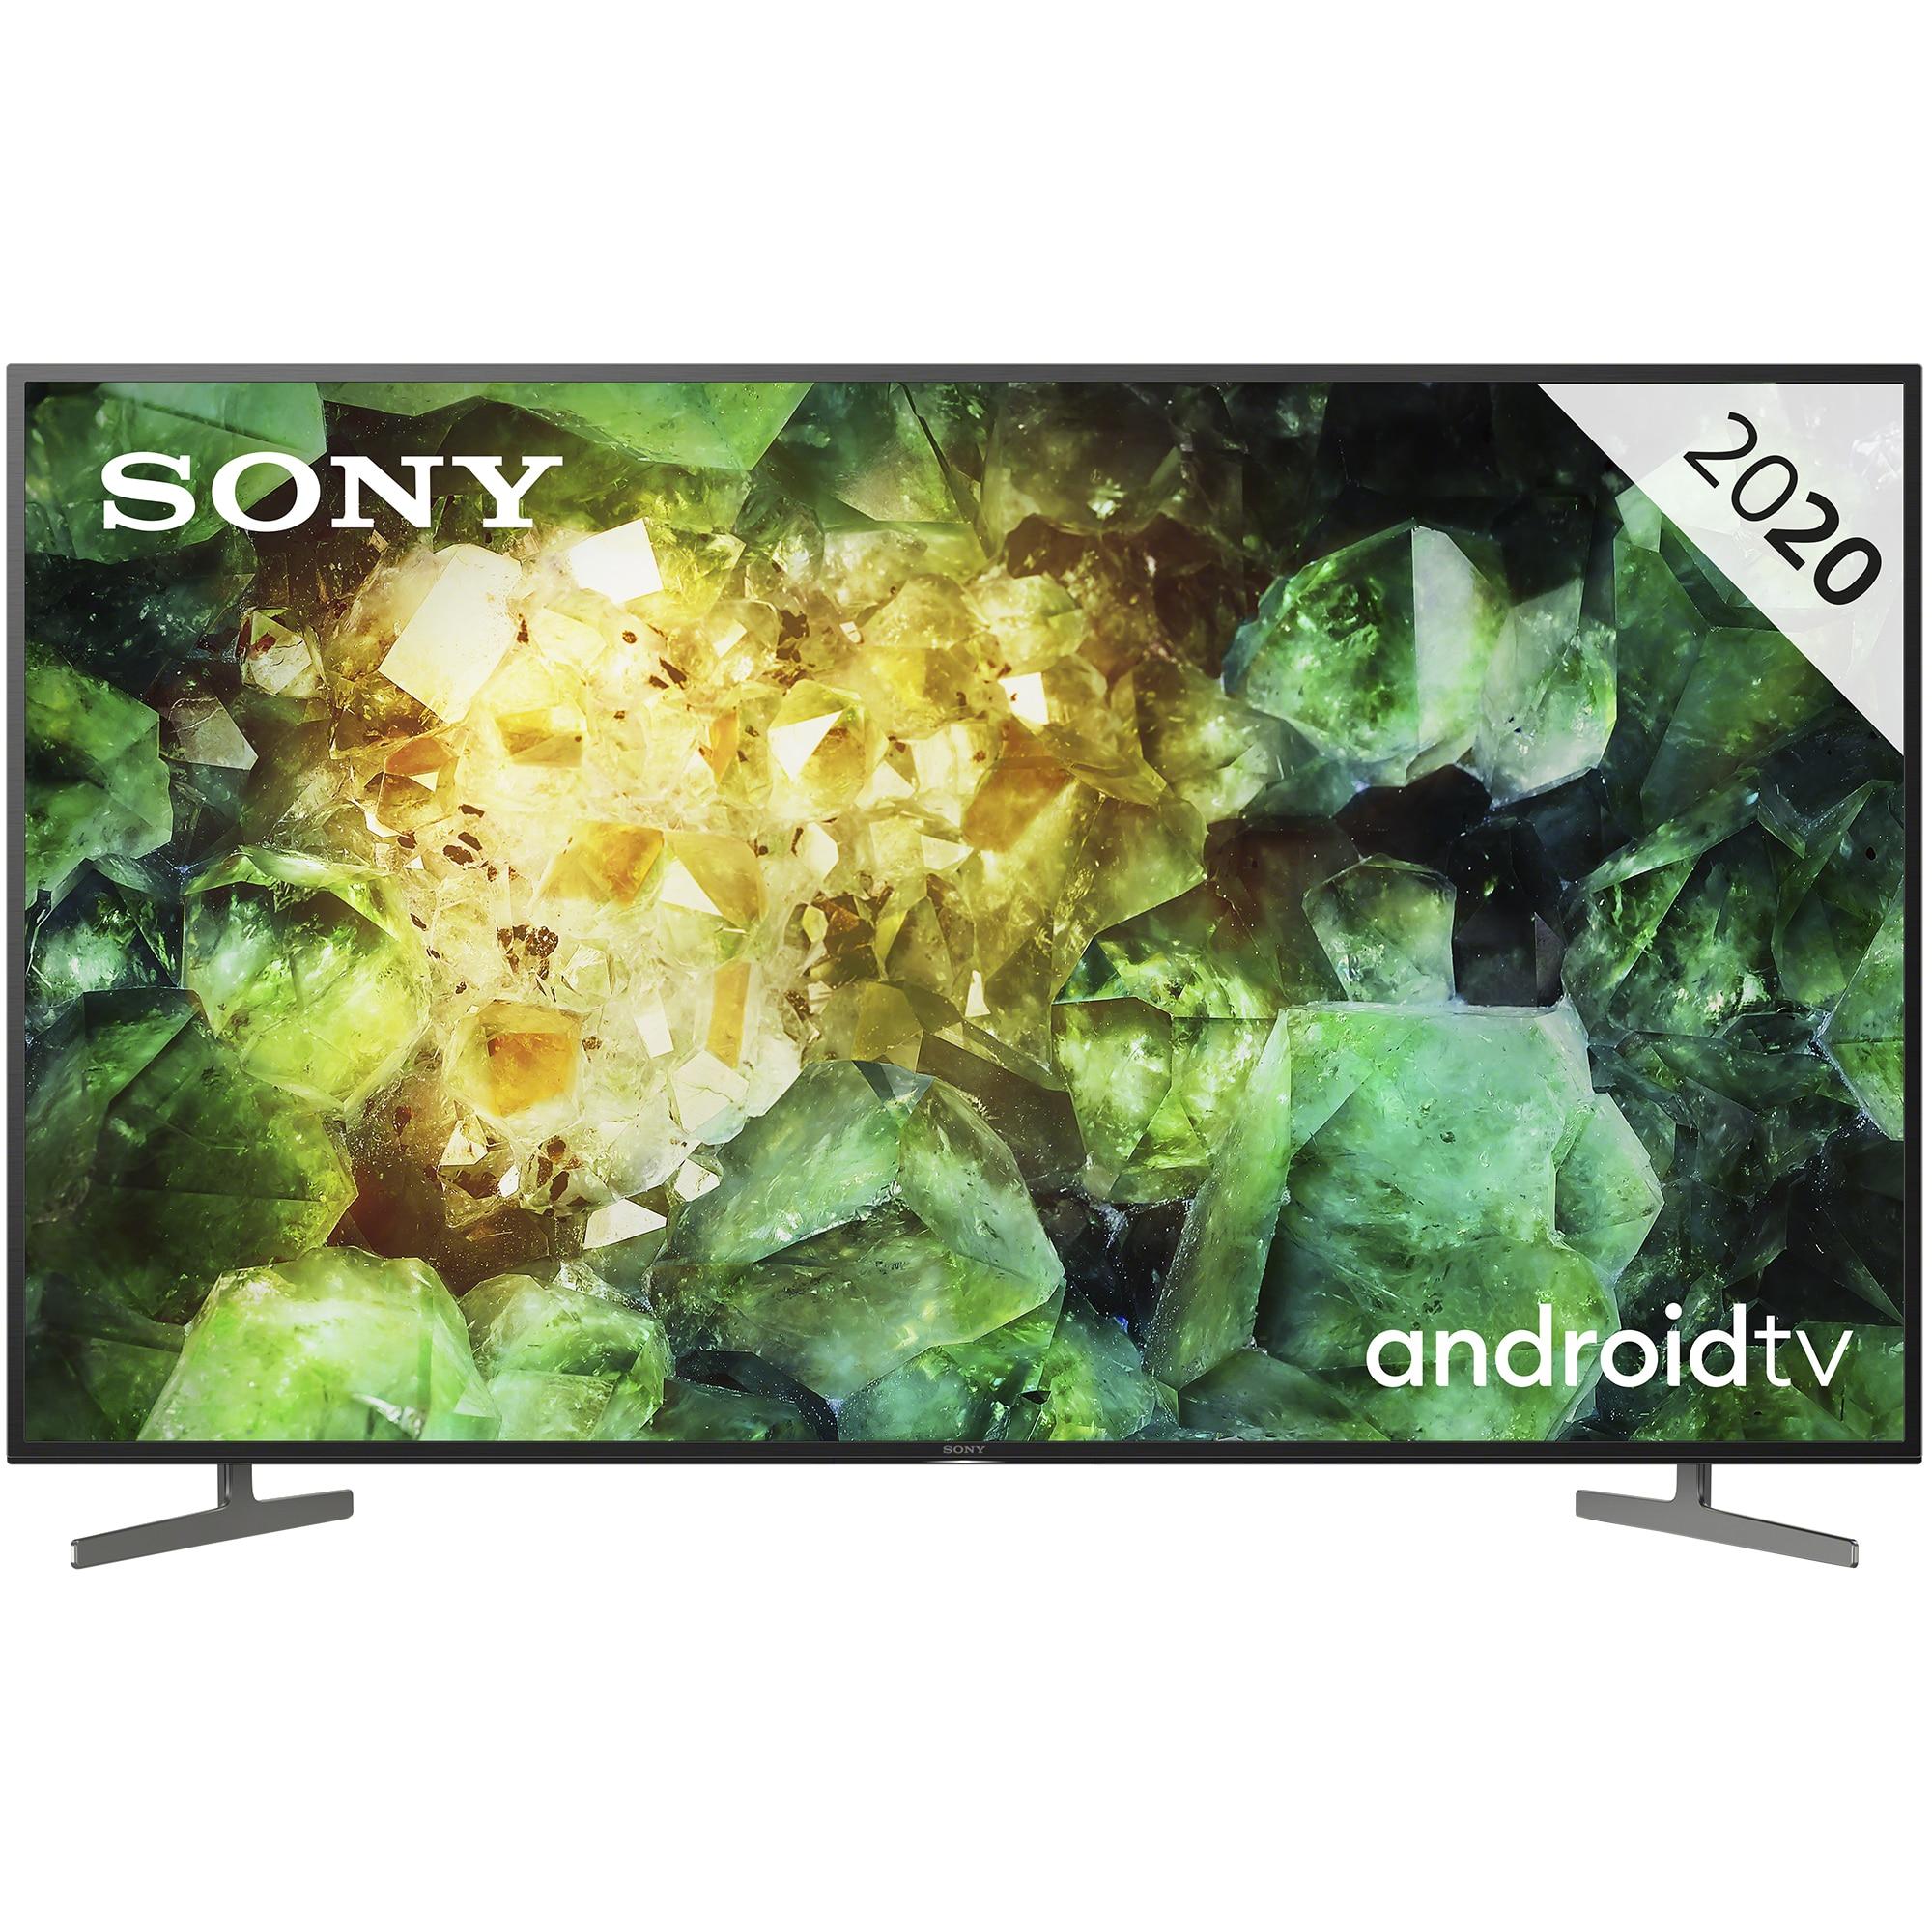 Fotografie Televizor Sony 55XH8196, 138.8 cm, Smart Android, 4K Ultra HD, LED, Clasa A